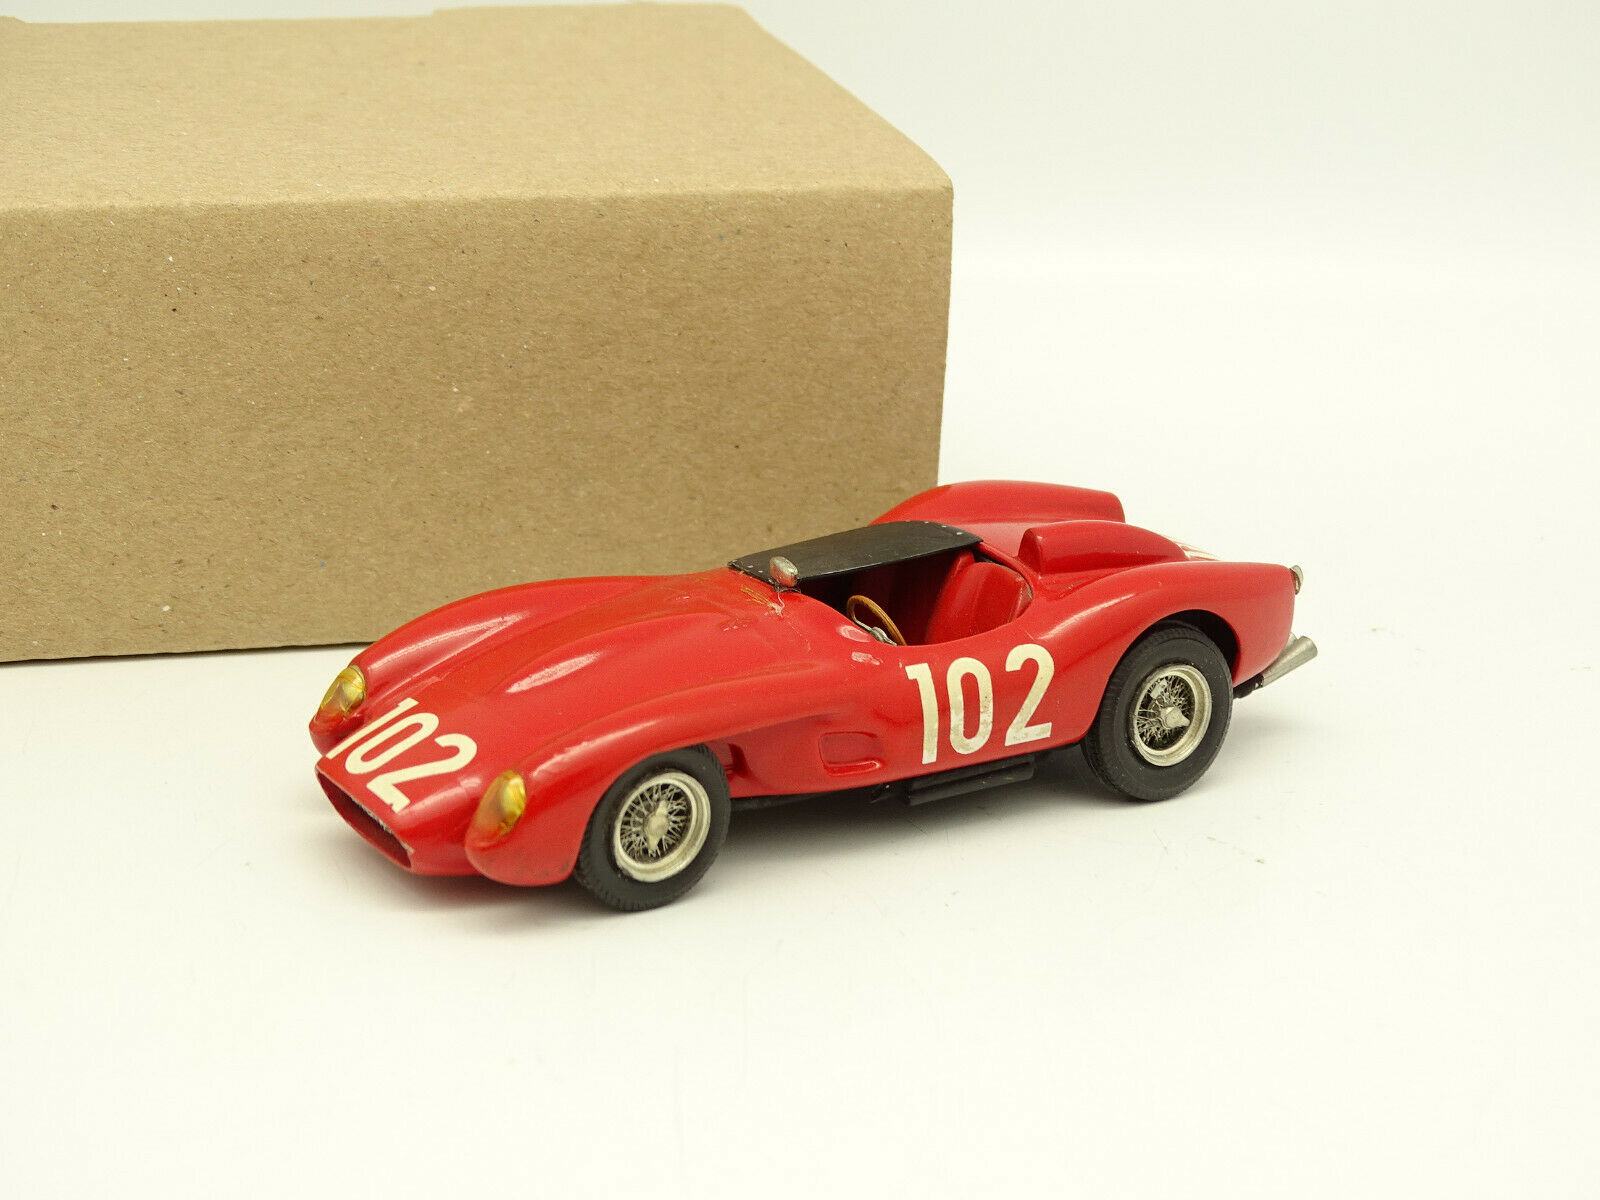 Esperando por ti Precision Miniatures Miniatures Miniatures Kit Monté Métal 1 43 - Ferrari 250 TR Tour de France 1958  oferta de tienda